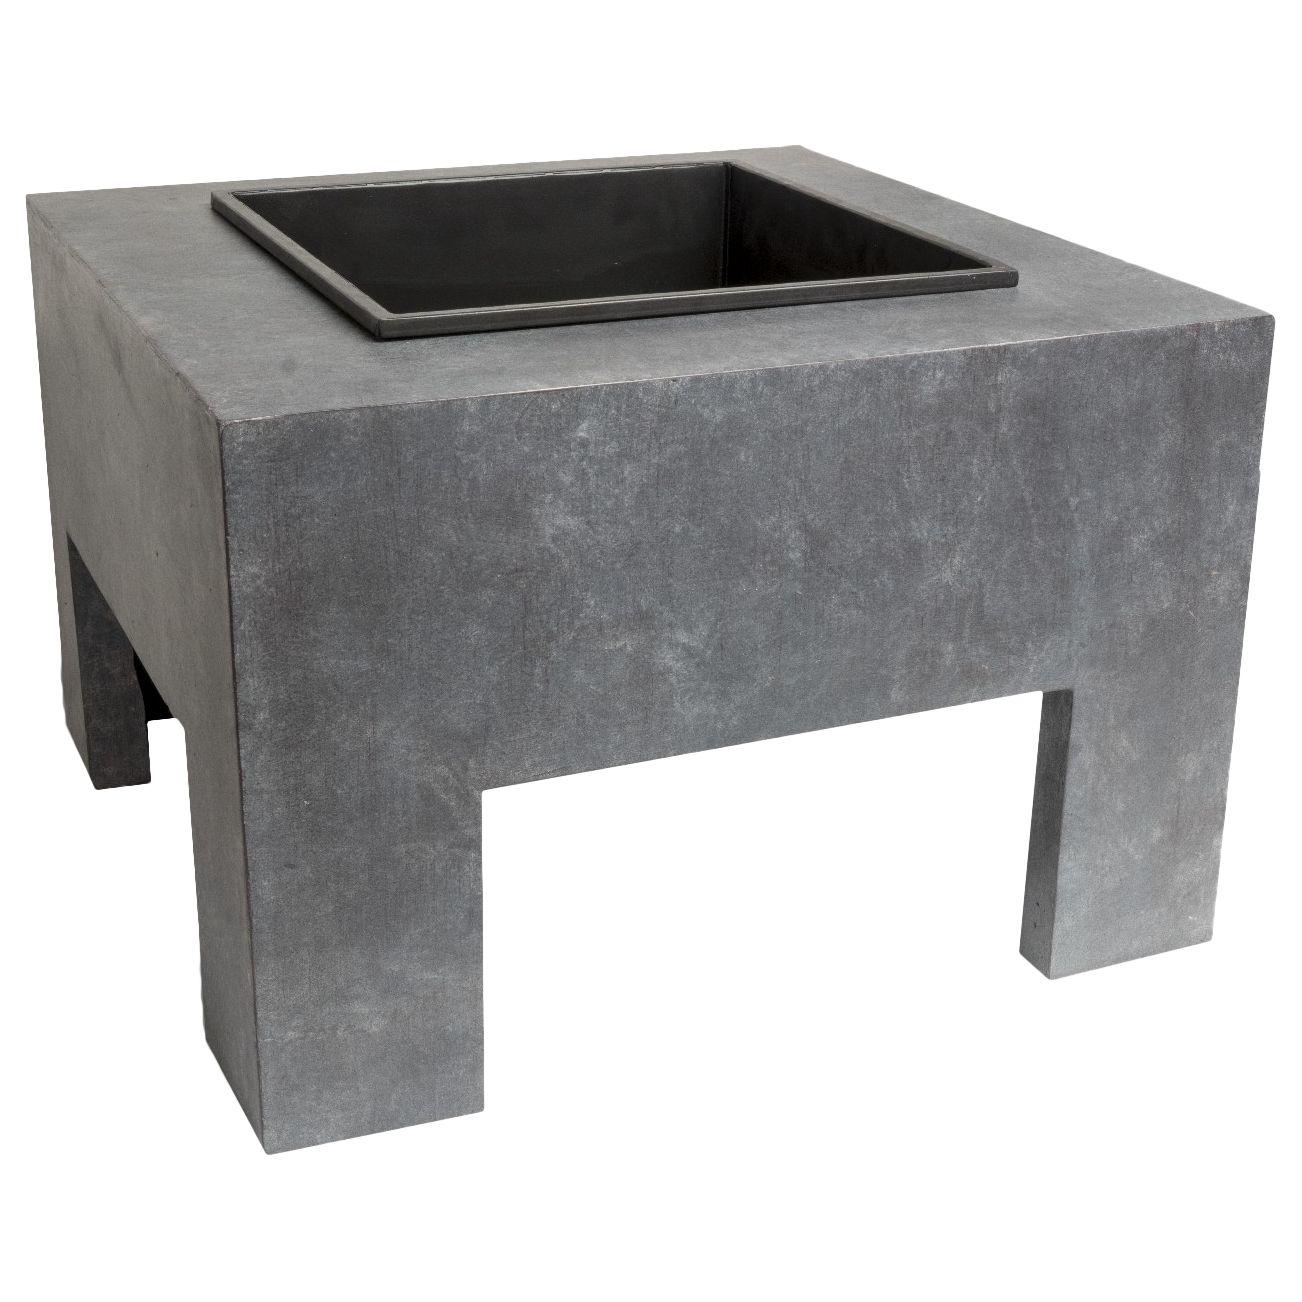 Ivyline Ivyline Square Firepit, Grey/Black